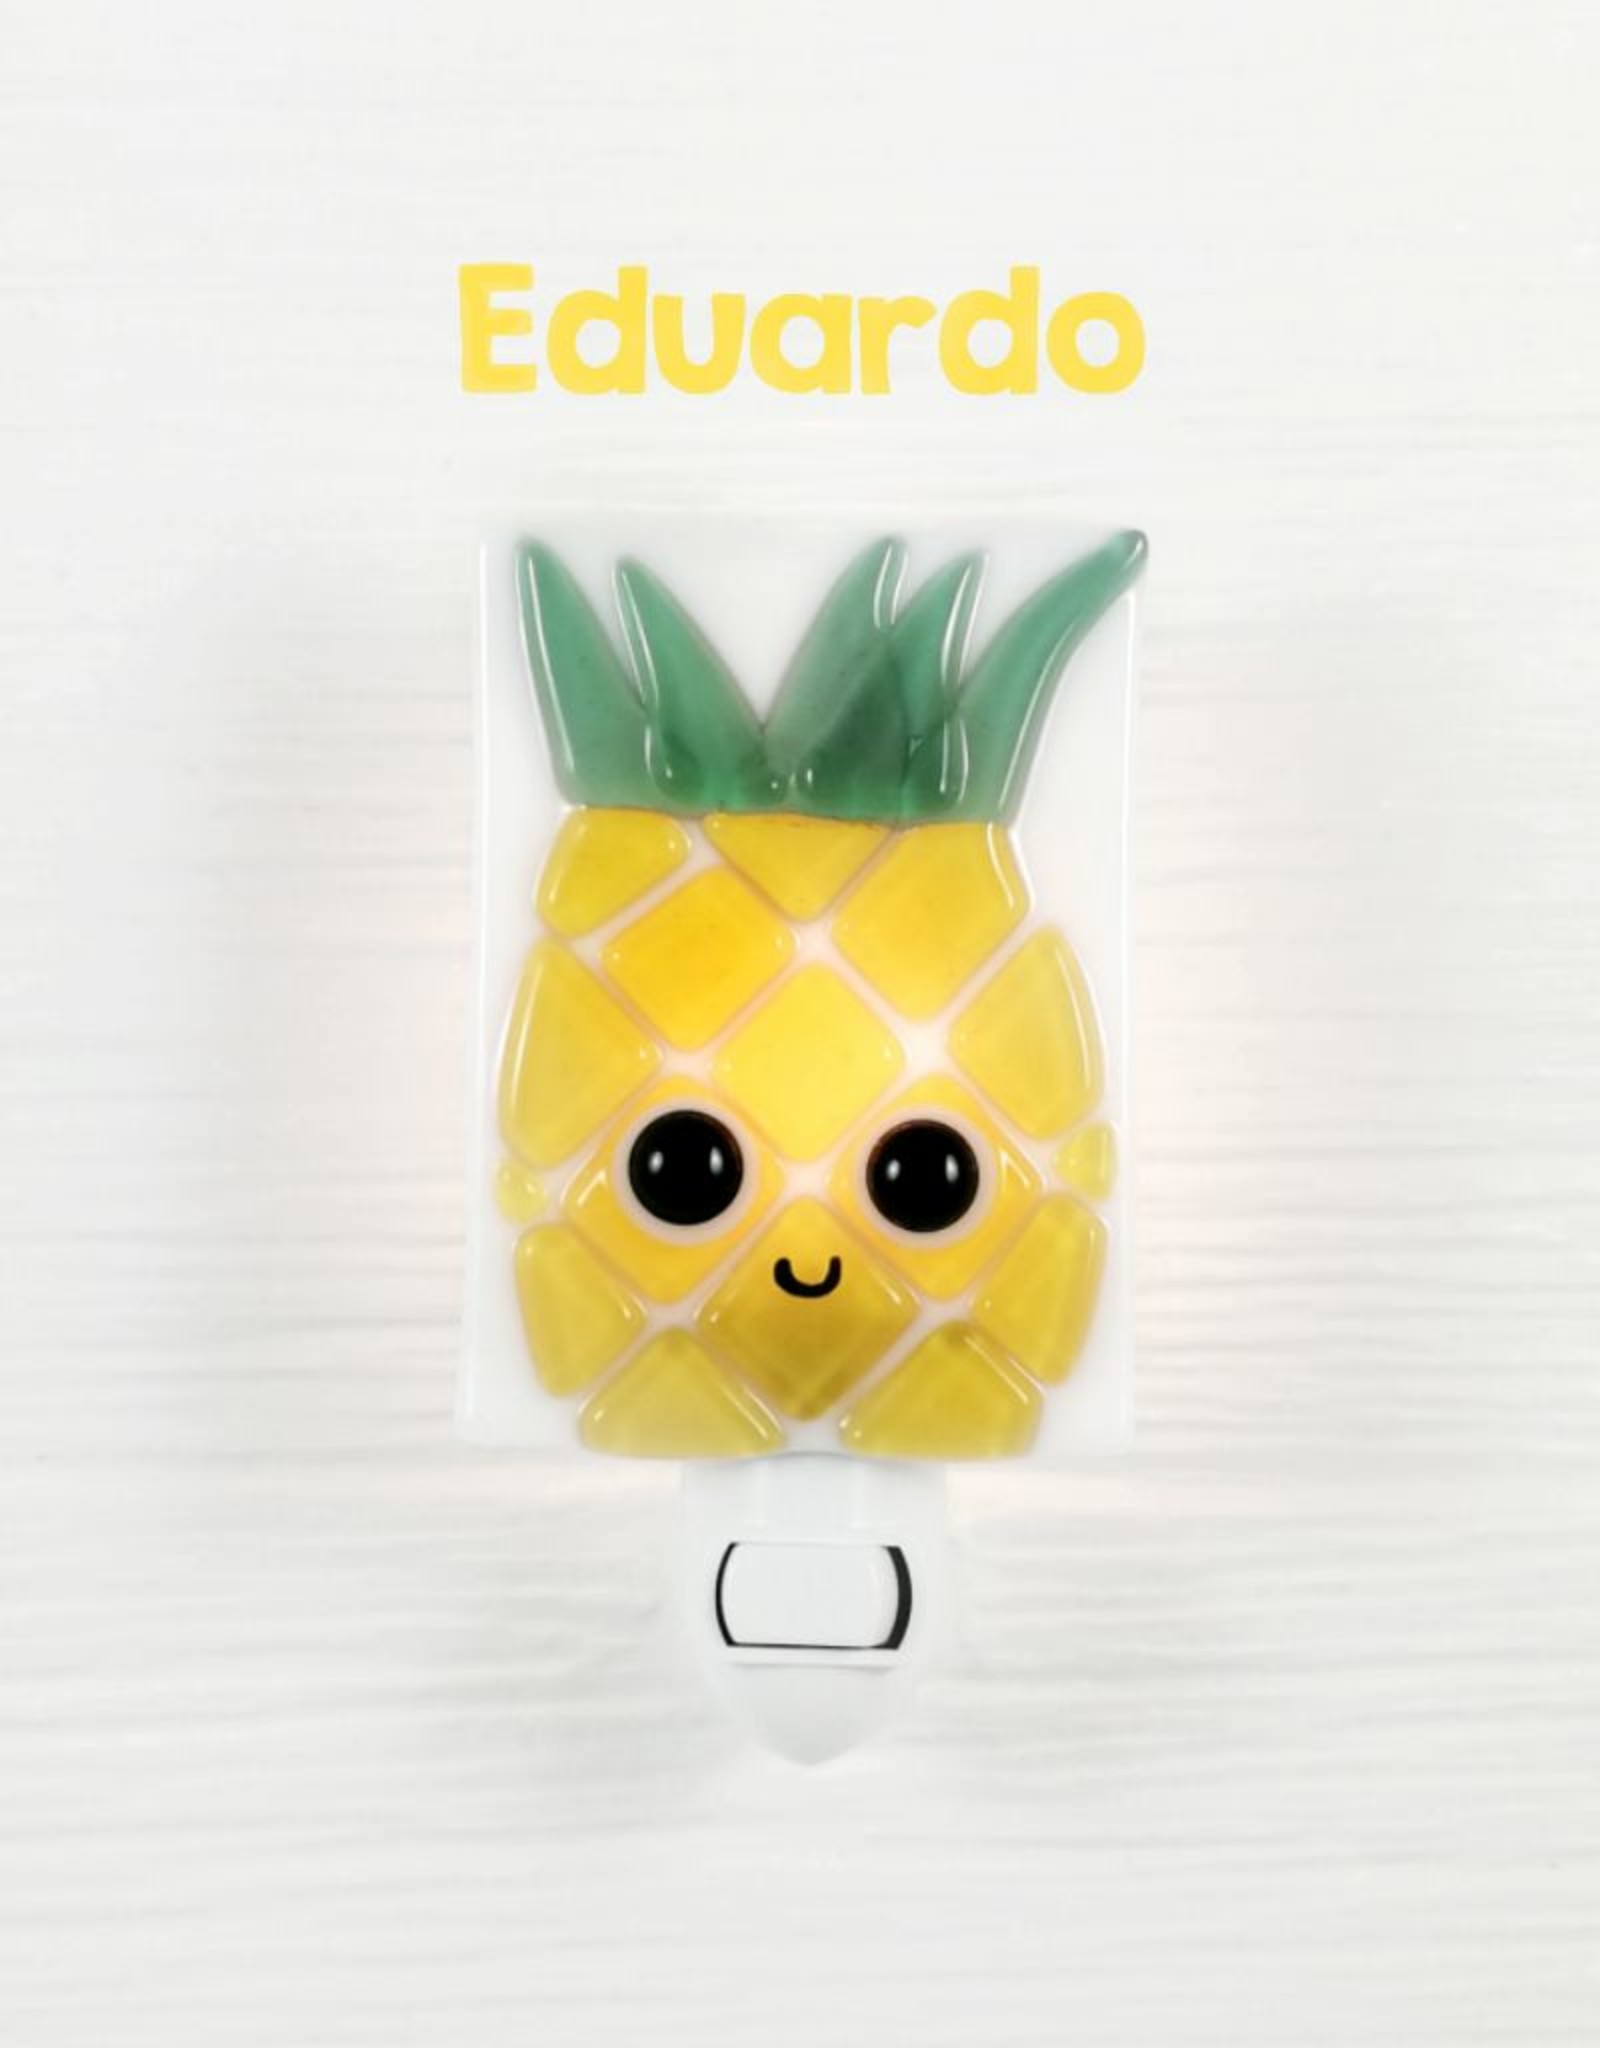 Veille sur toi Veilleuse - Ananas - Eduardo